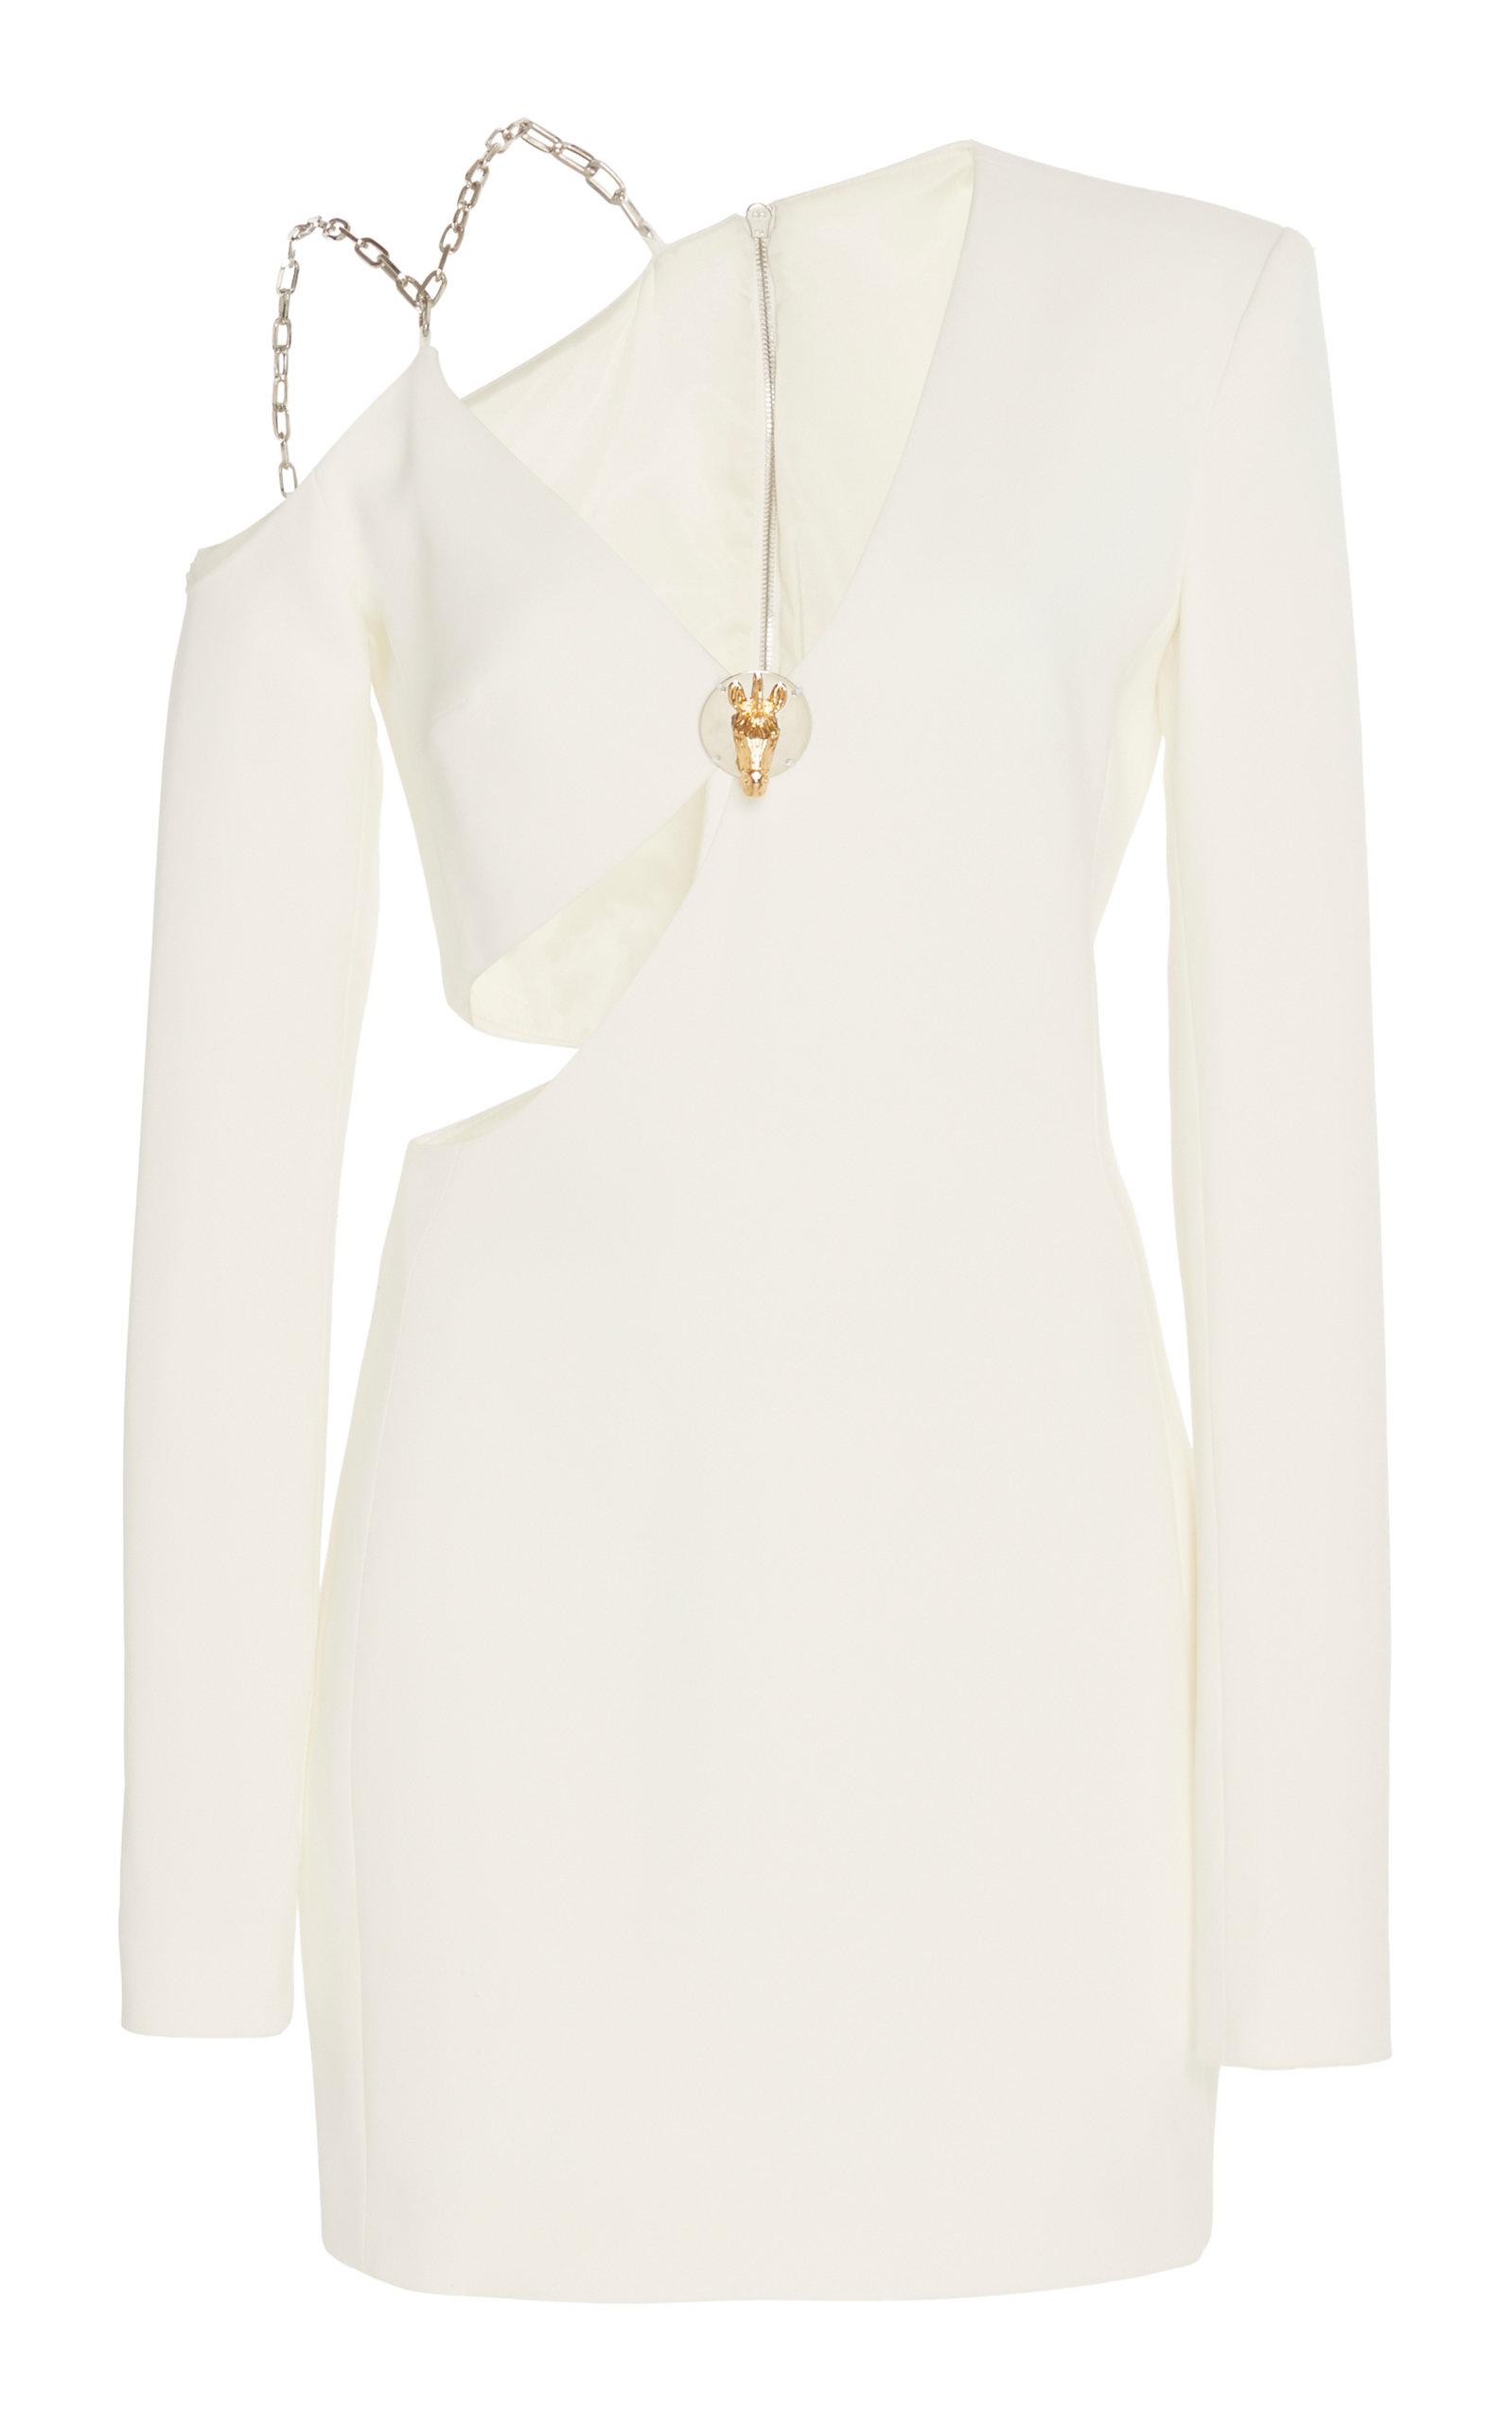 Buy David Koma Asymmetric Cold-Shoulder Crepe Dress online, shop David Koma at the best price